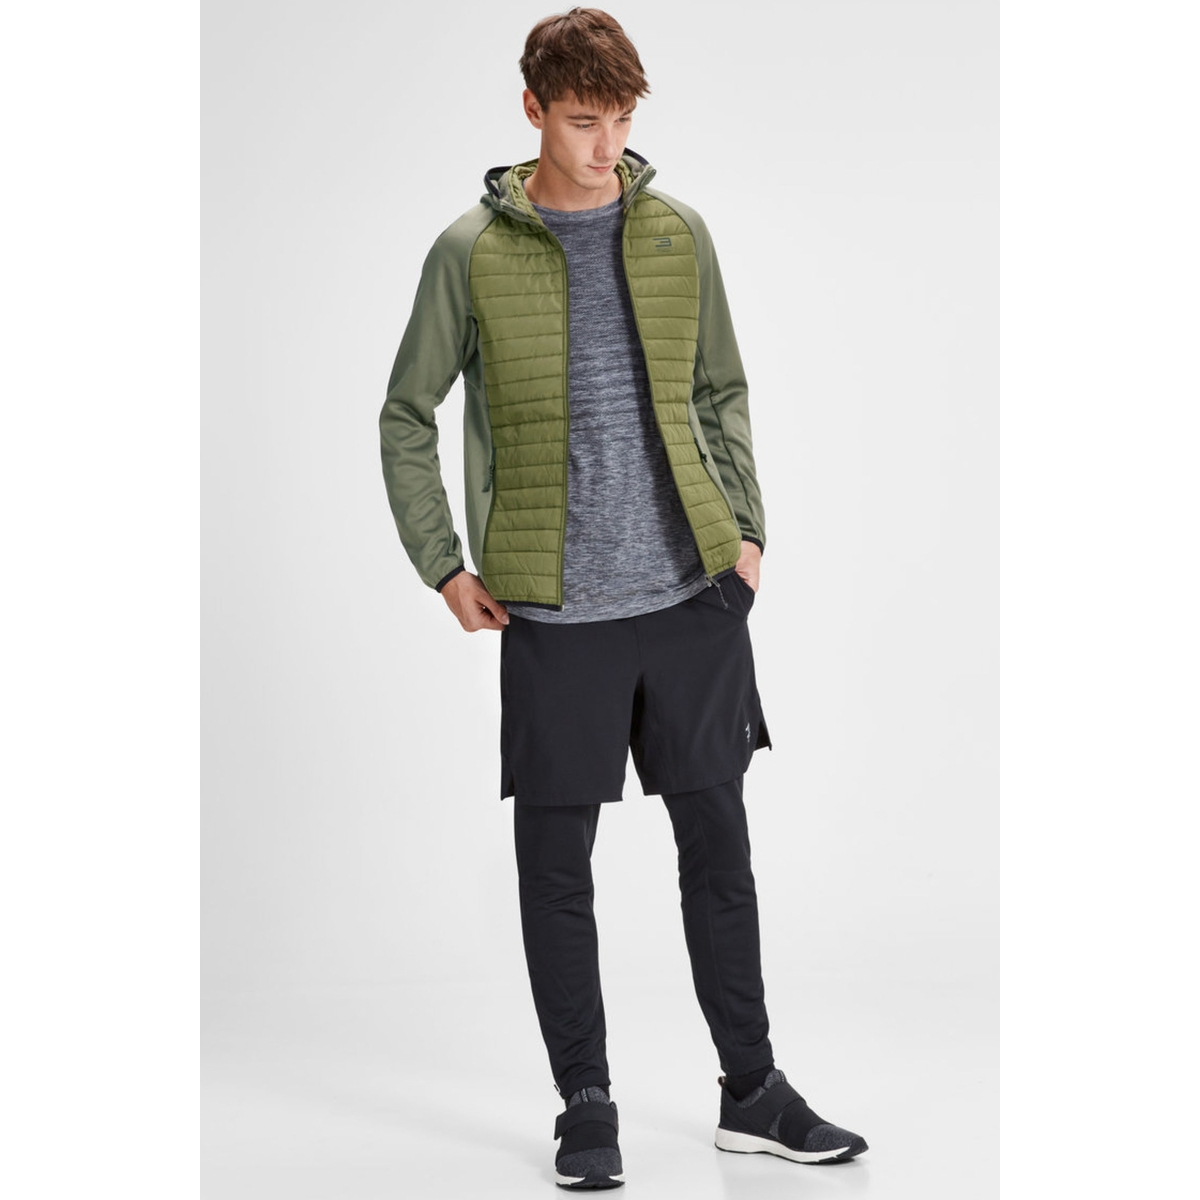 jcomulti quilted jacket noos 12110590 jack & jones jas olive night